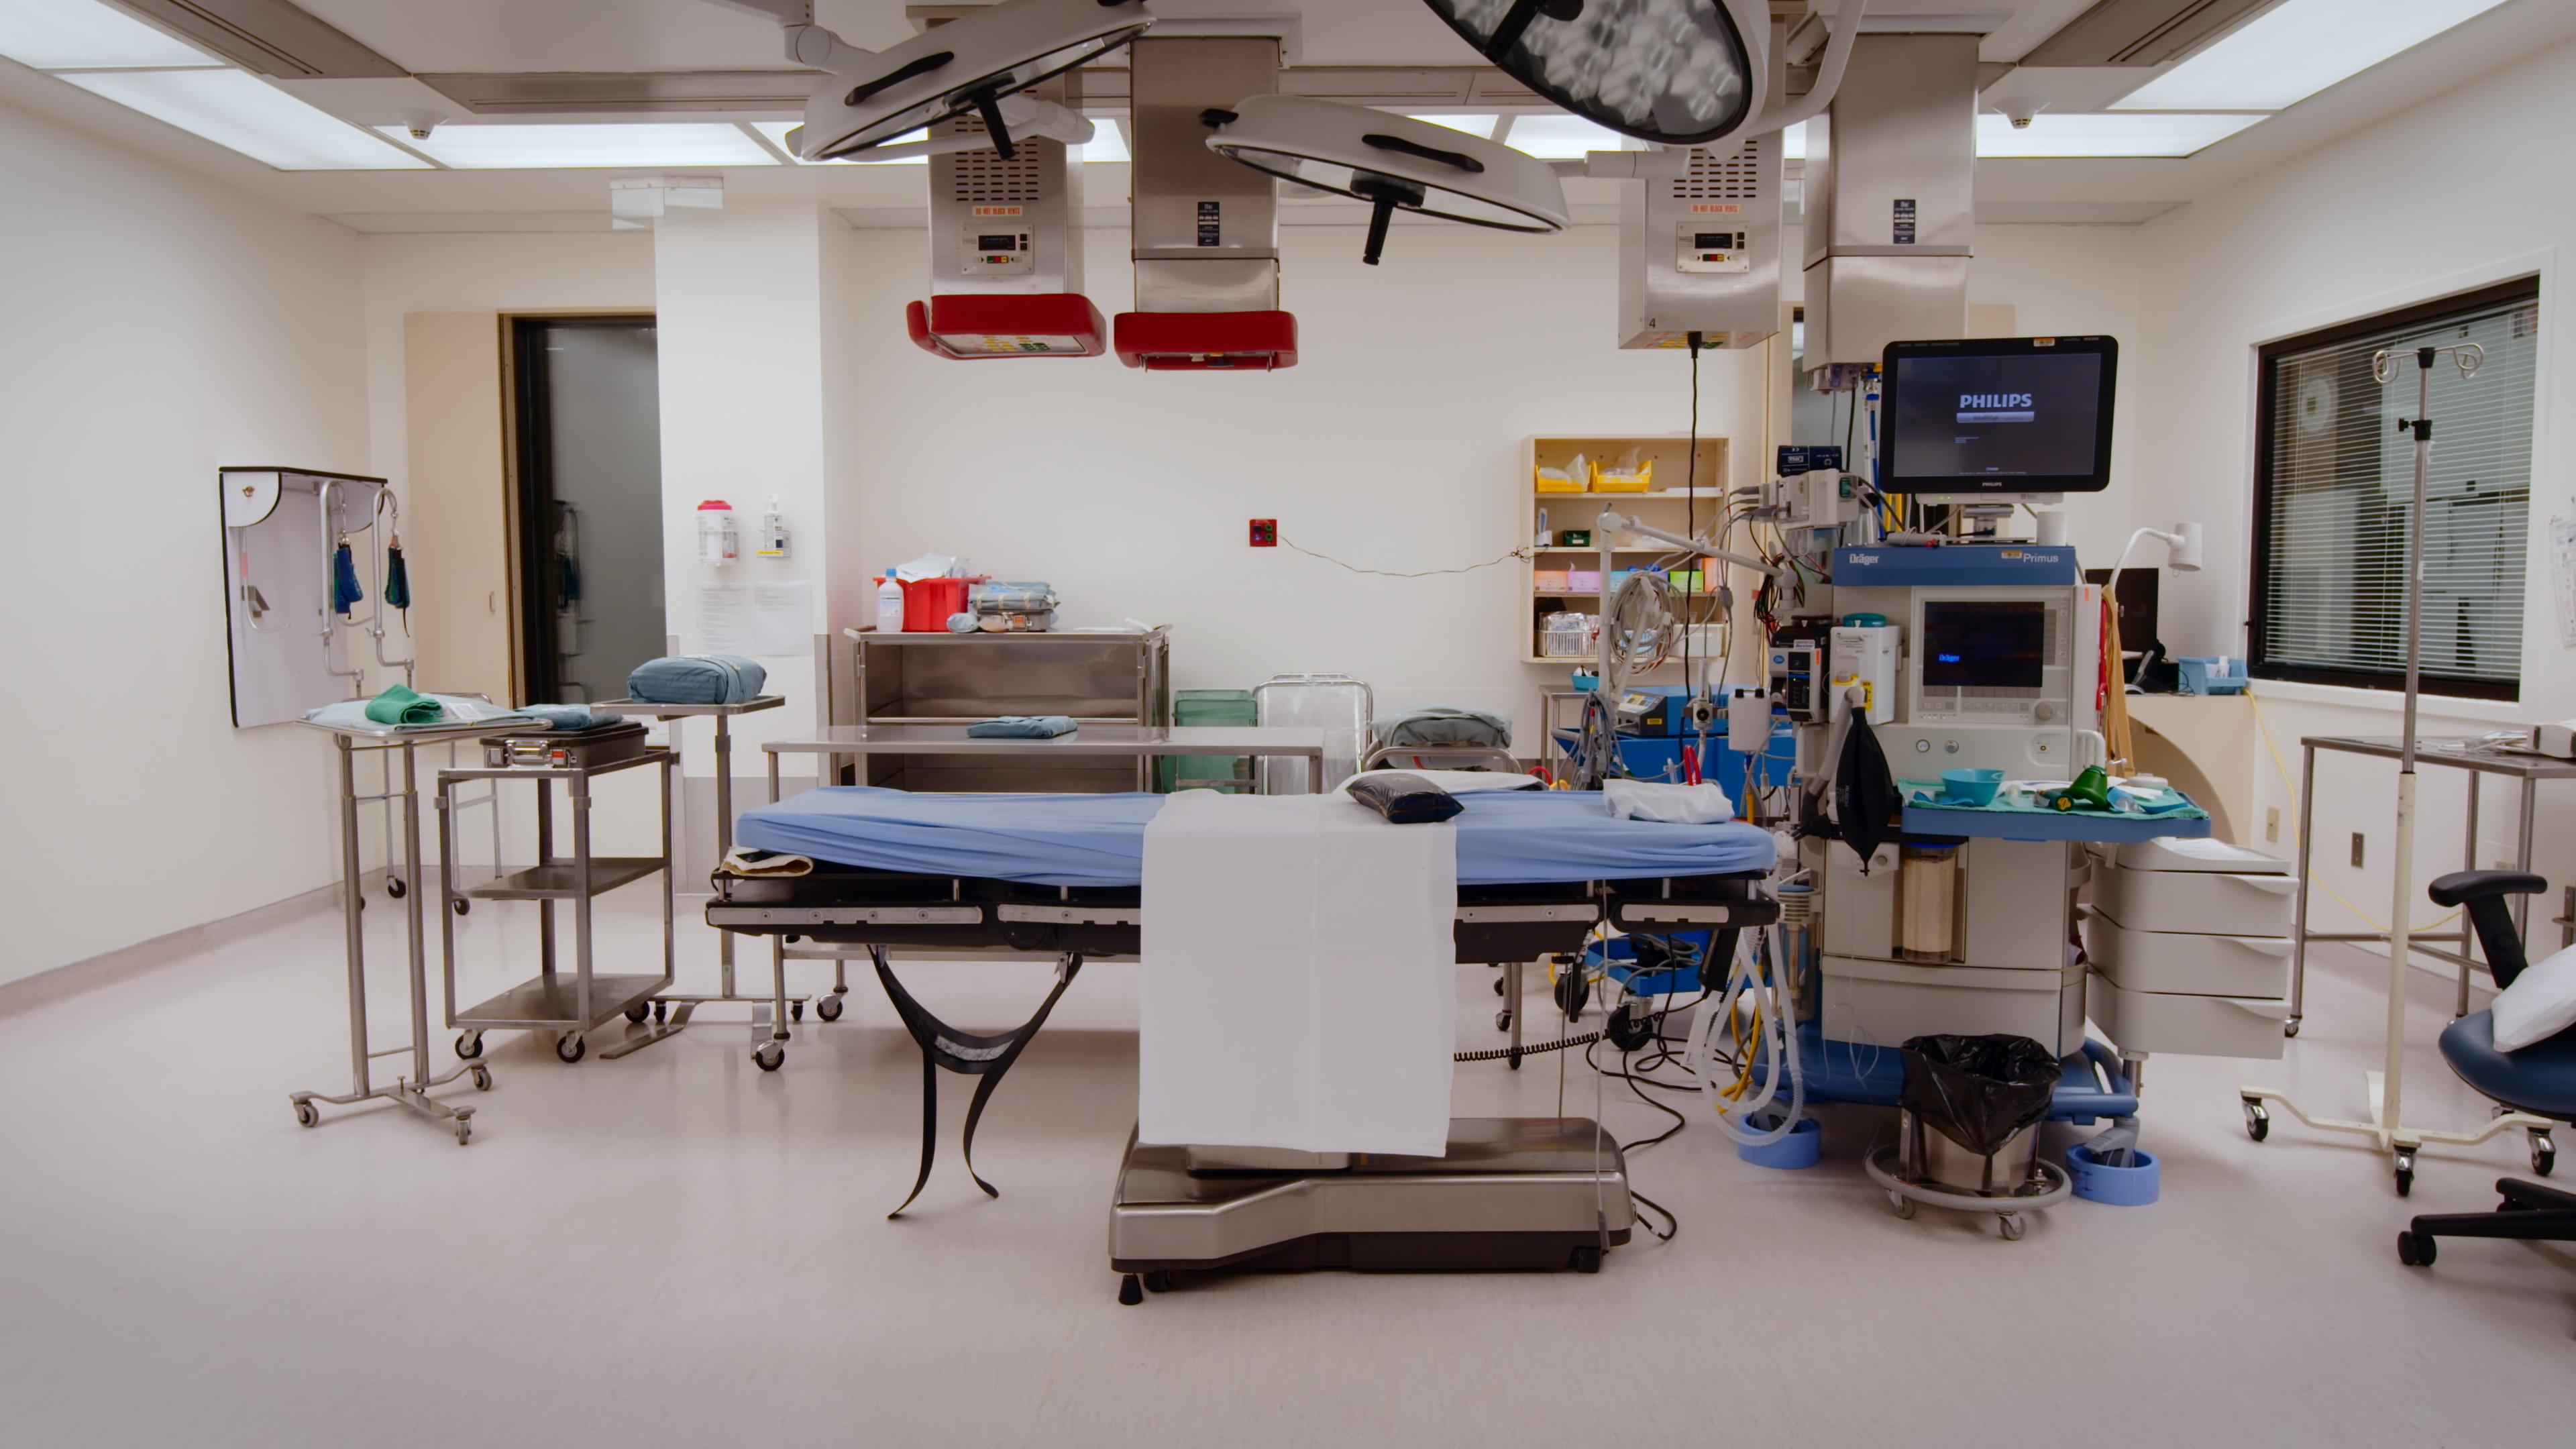 Operating room at the University of Alberta Hospital